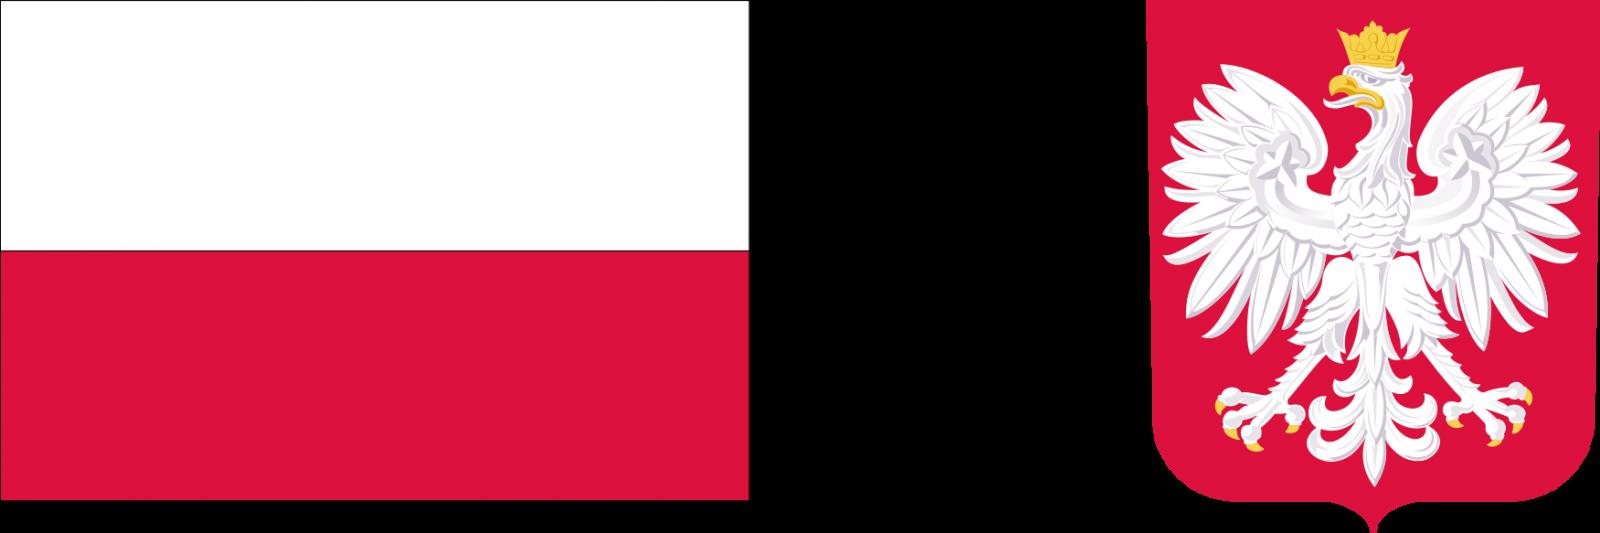 Flaga i Herb Polski